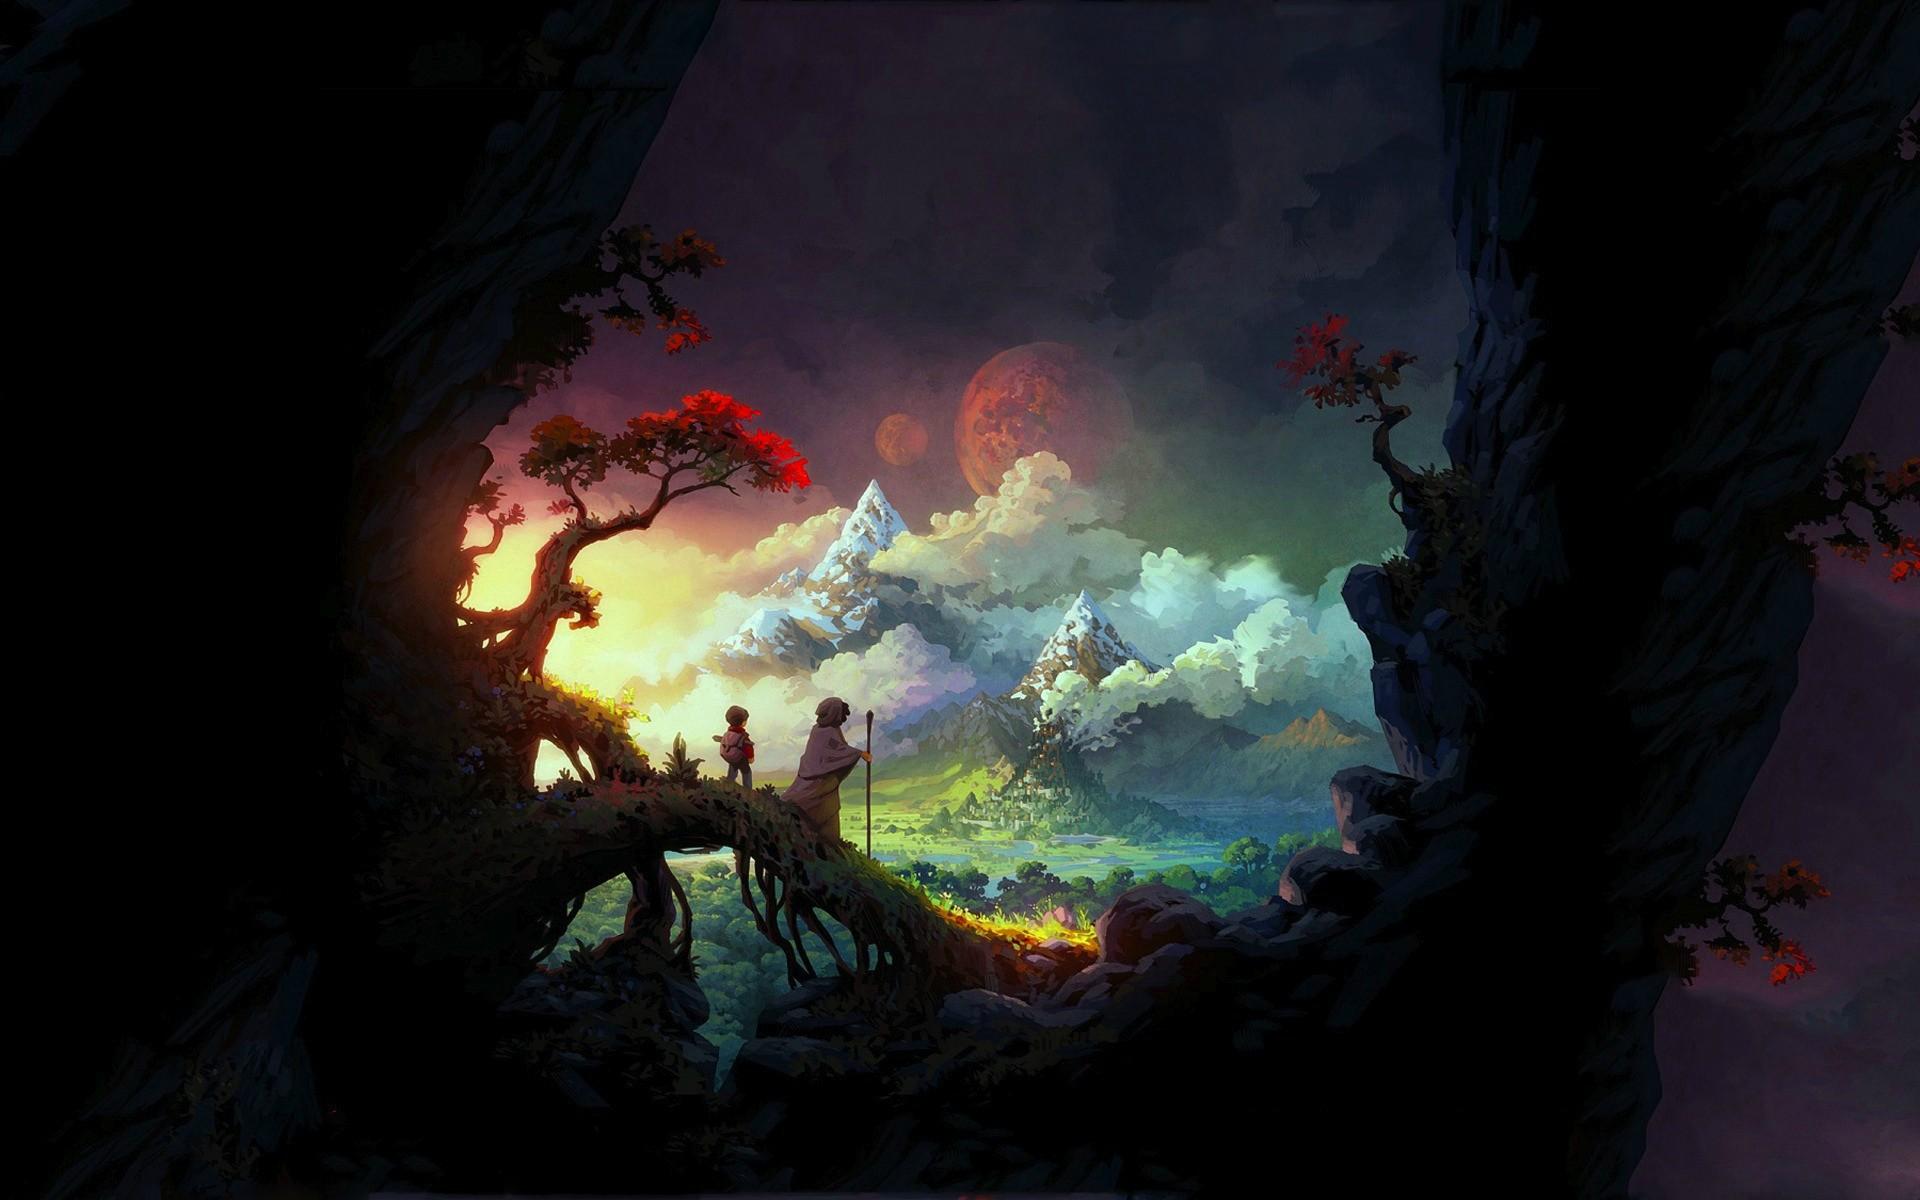 General-x-colorful-The-Wormworld-Saga-Daniel-Lieske-wallpaper-wp5206957